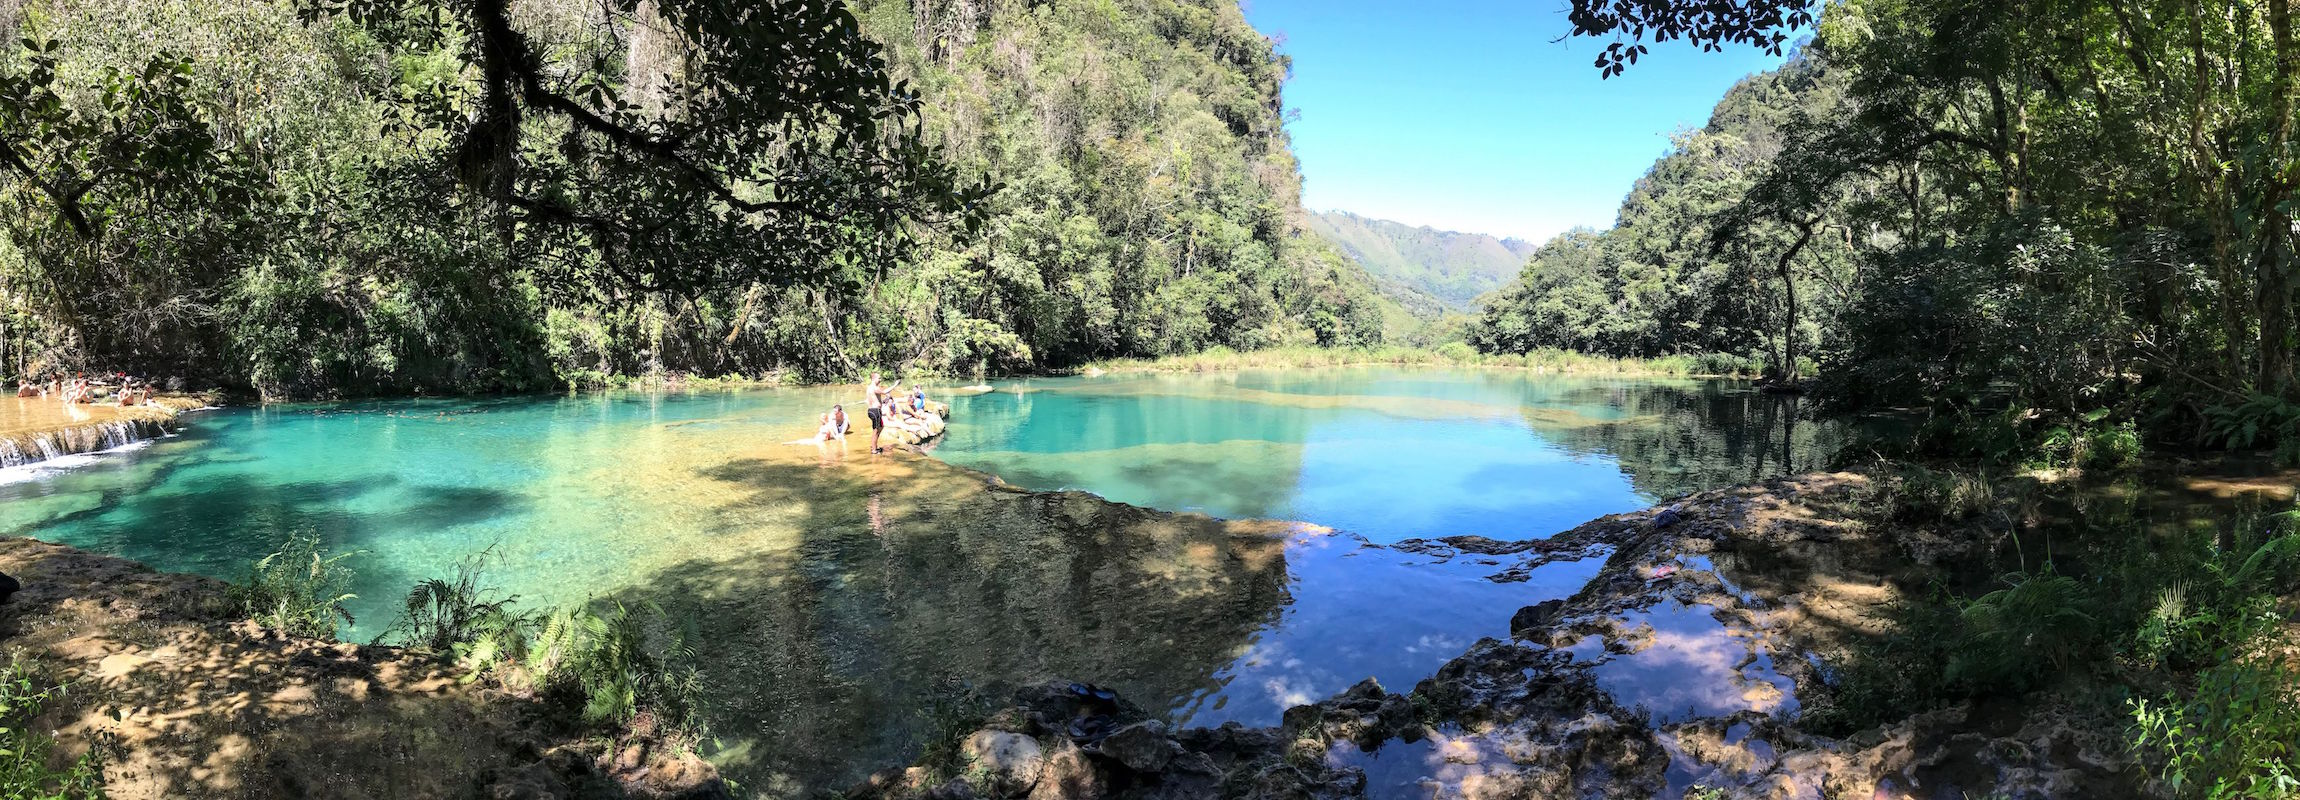 Semuc Champey Guatemala pools